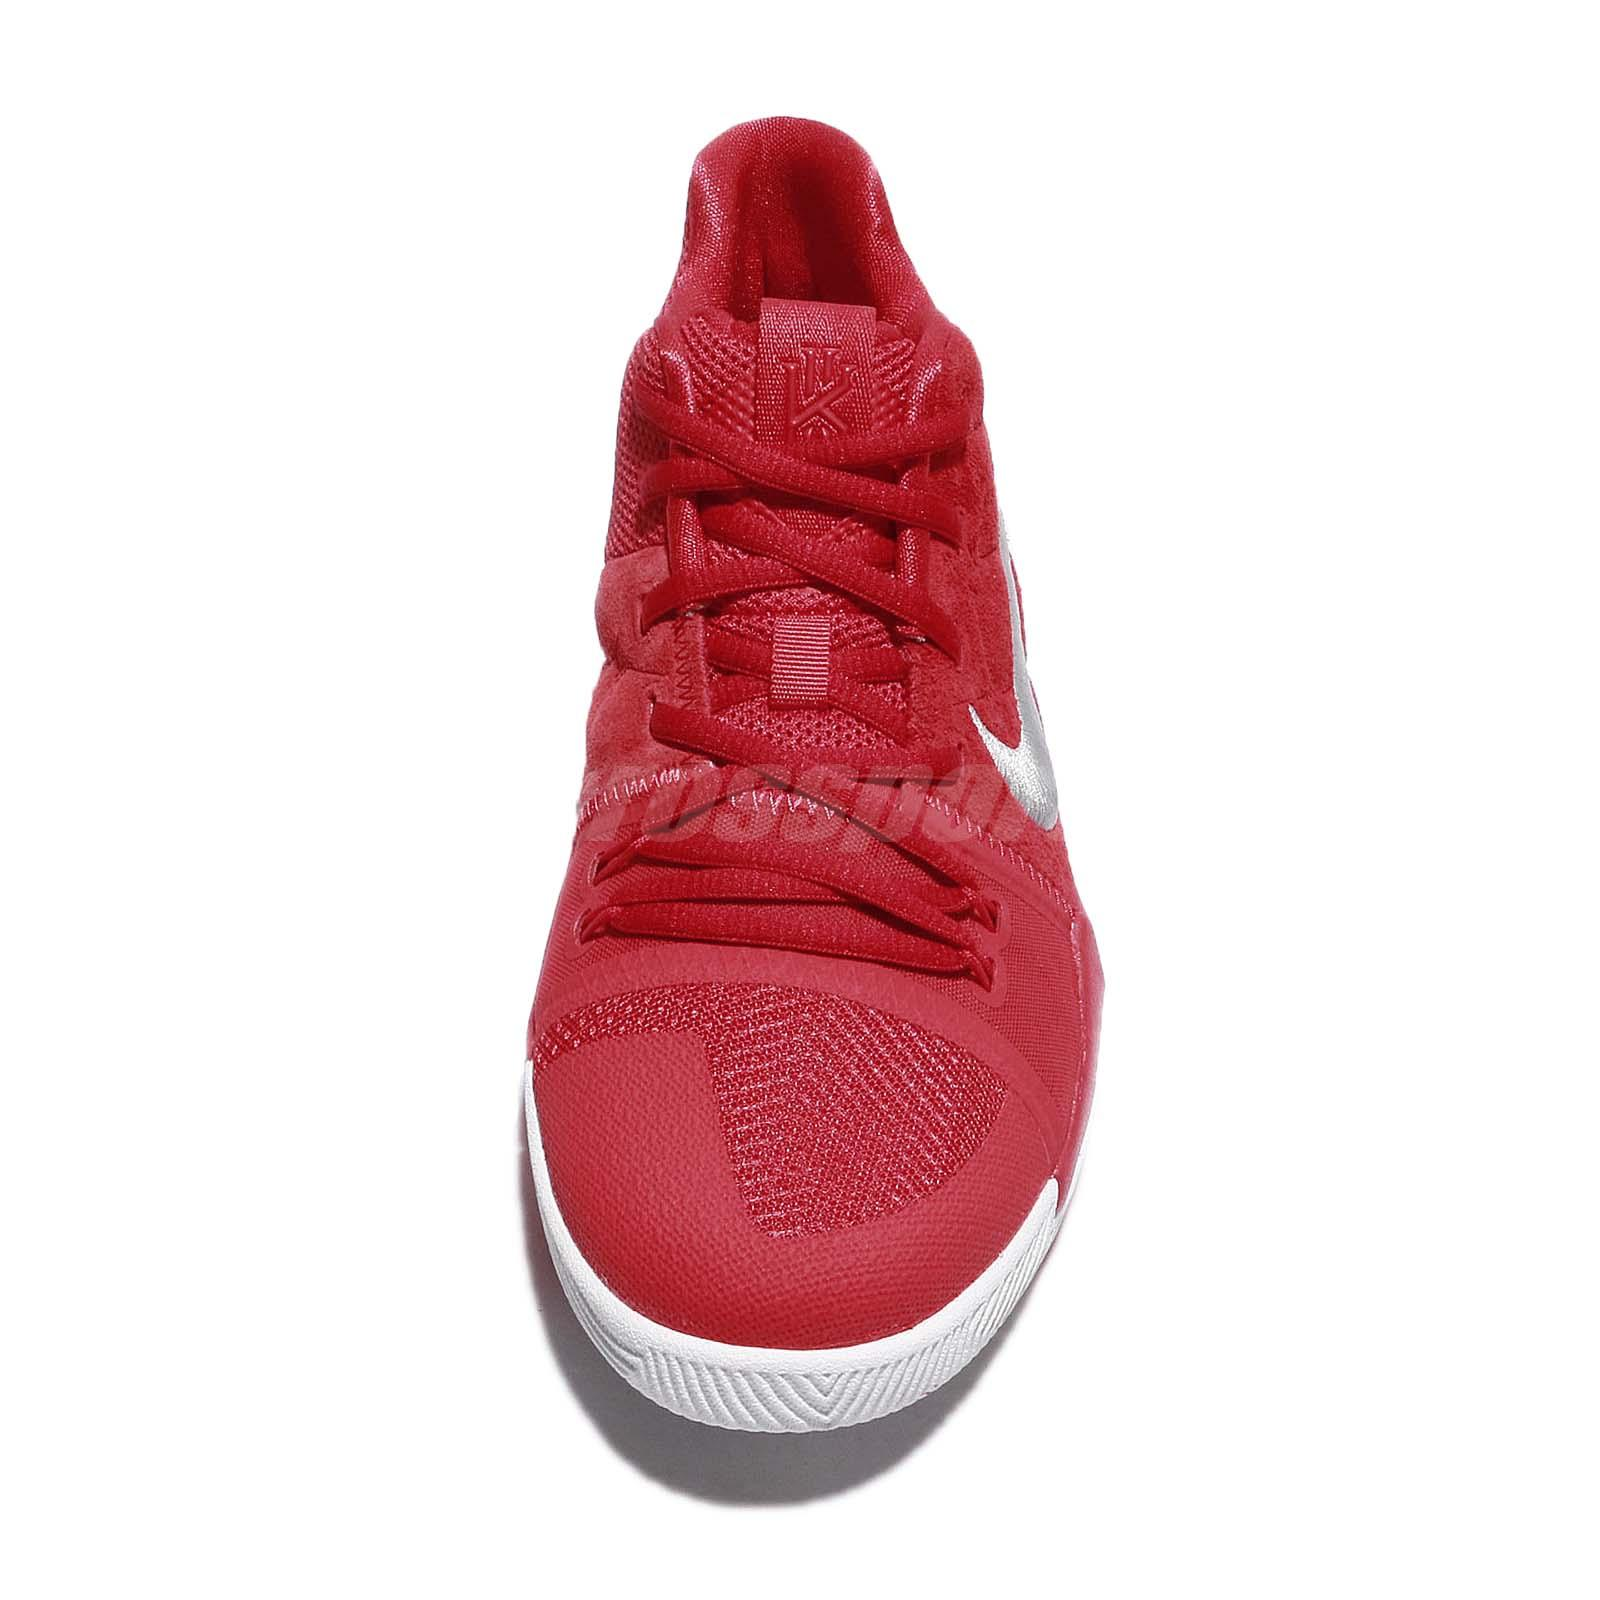 sports shoes 7f5b1 00e31 ... usa nike kyrie 3 gs iii university red white kids women basketball  shoes 0c5f5 bdb88